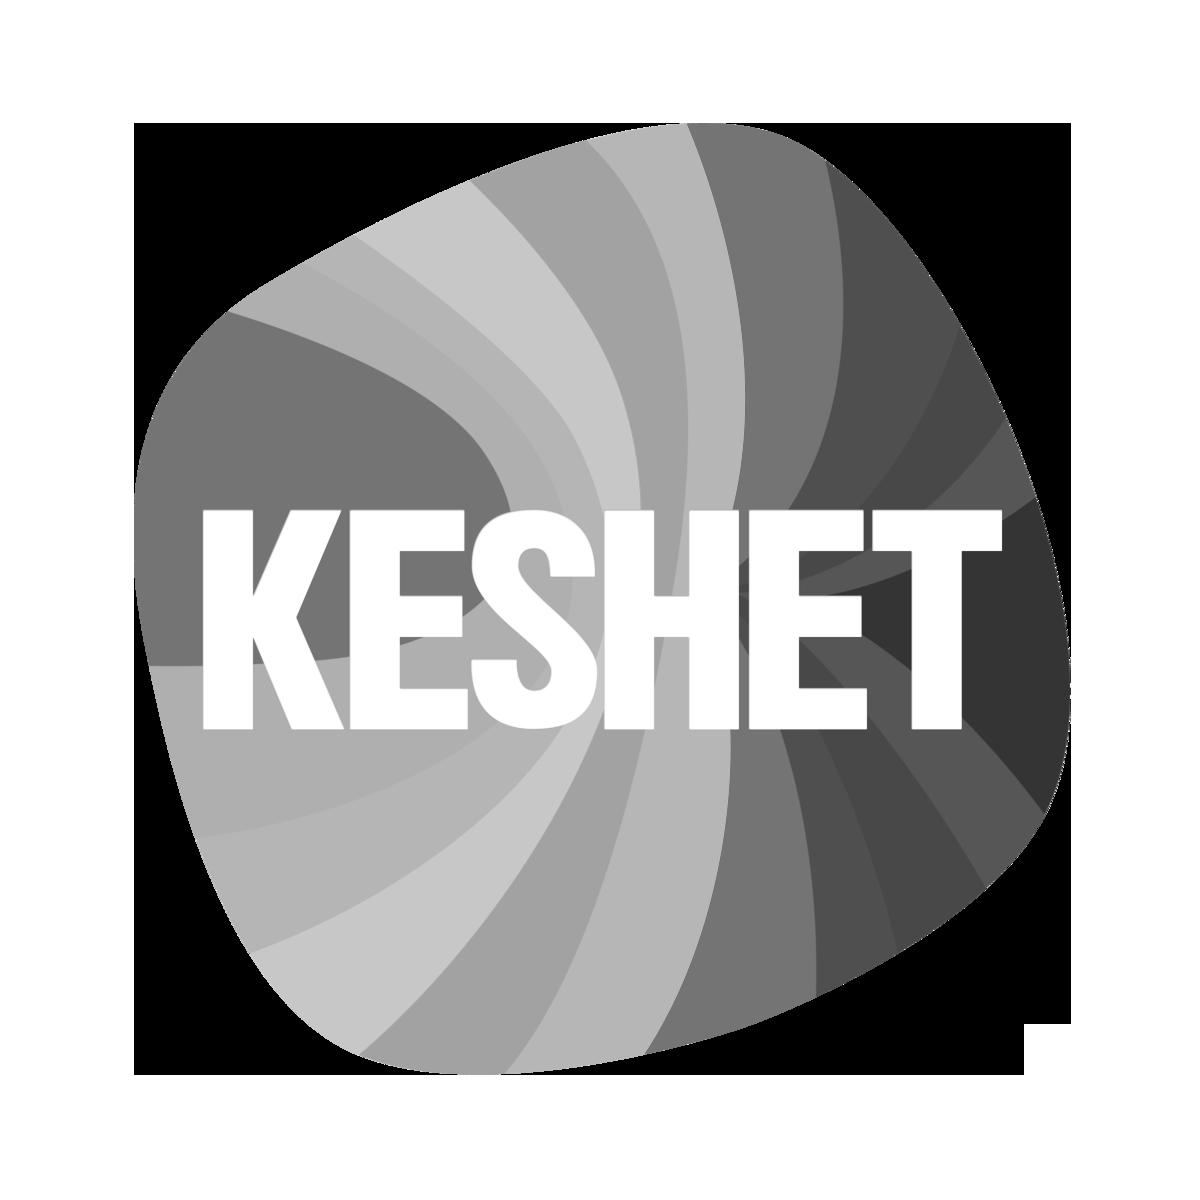 Logokeshet_ENG_print.png